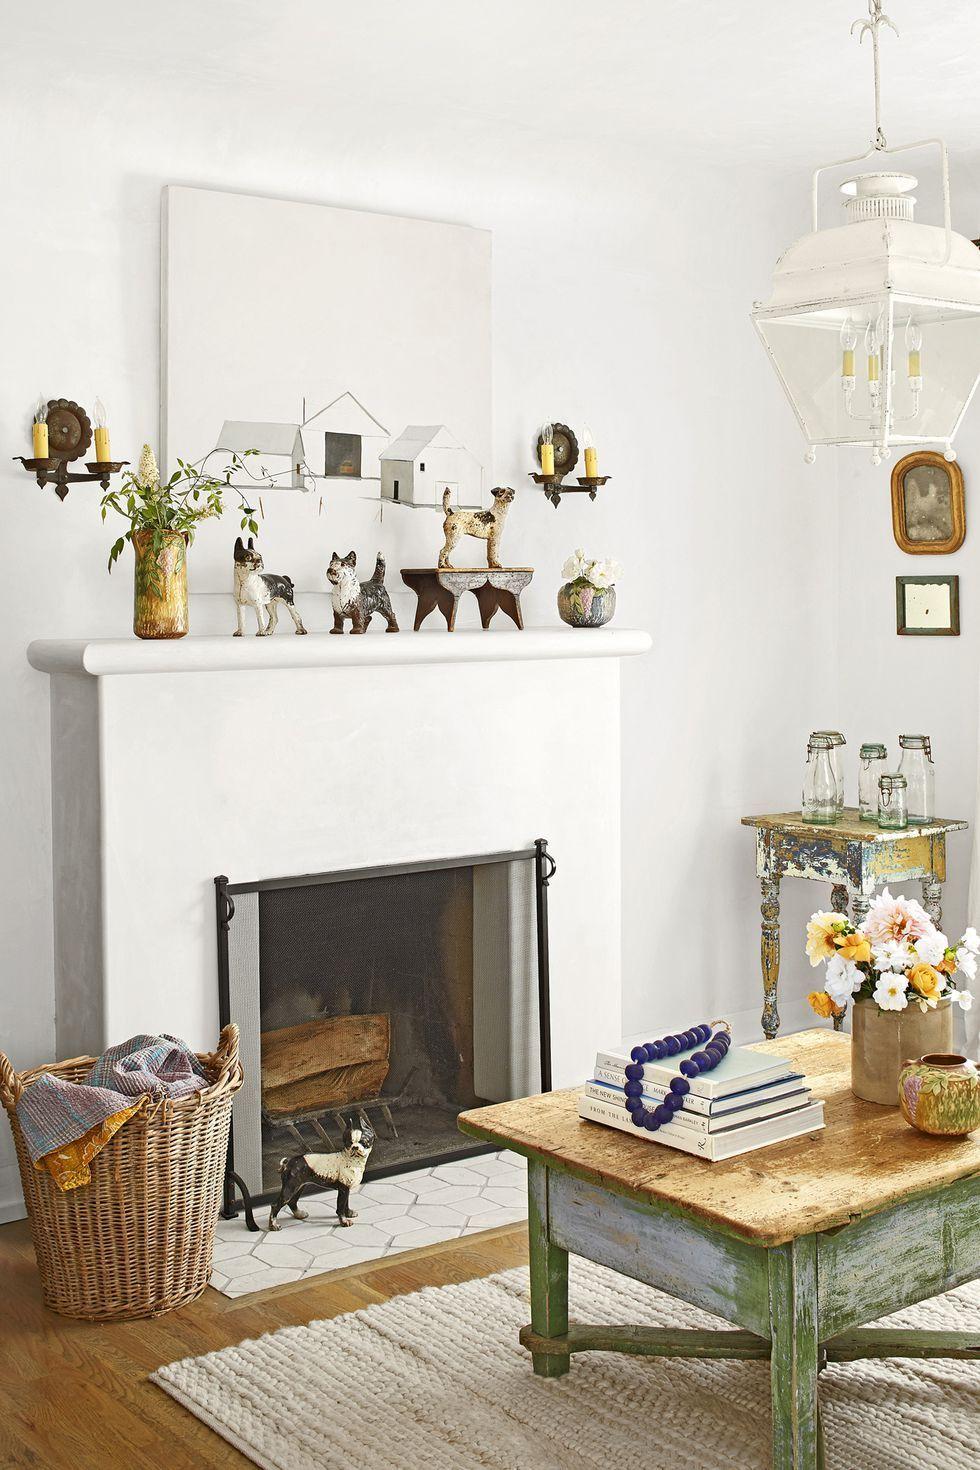 40 fireplace design ideas fireplace mantel decorating ideas rh countryliving com fireplace ideas electric fireplace ideas tile